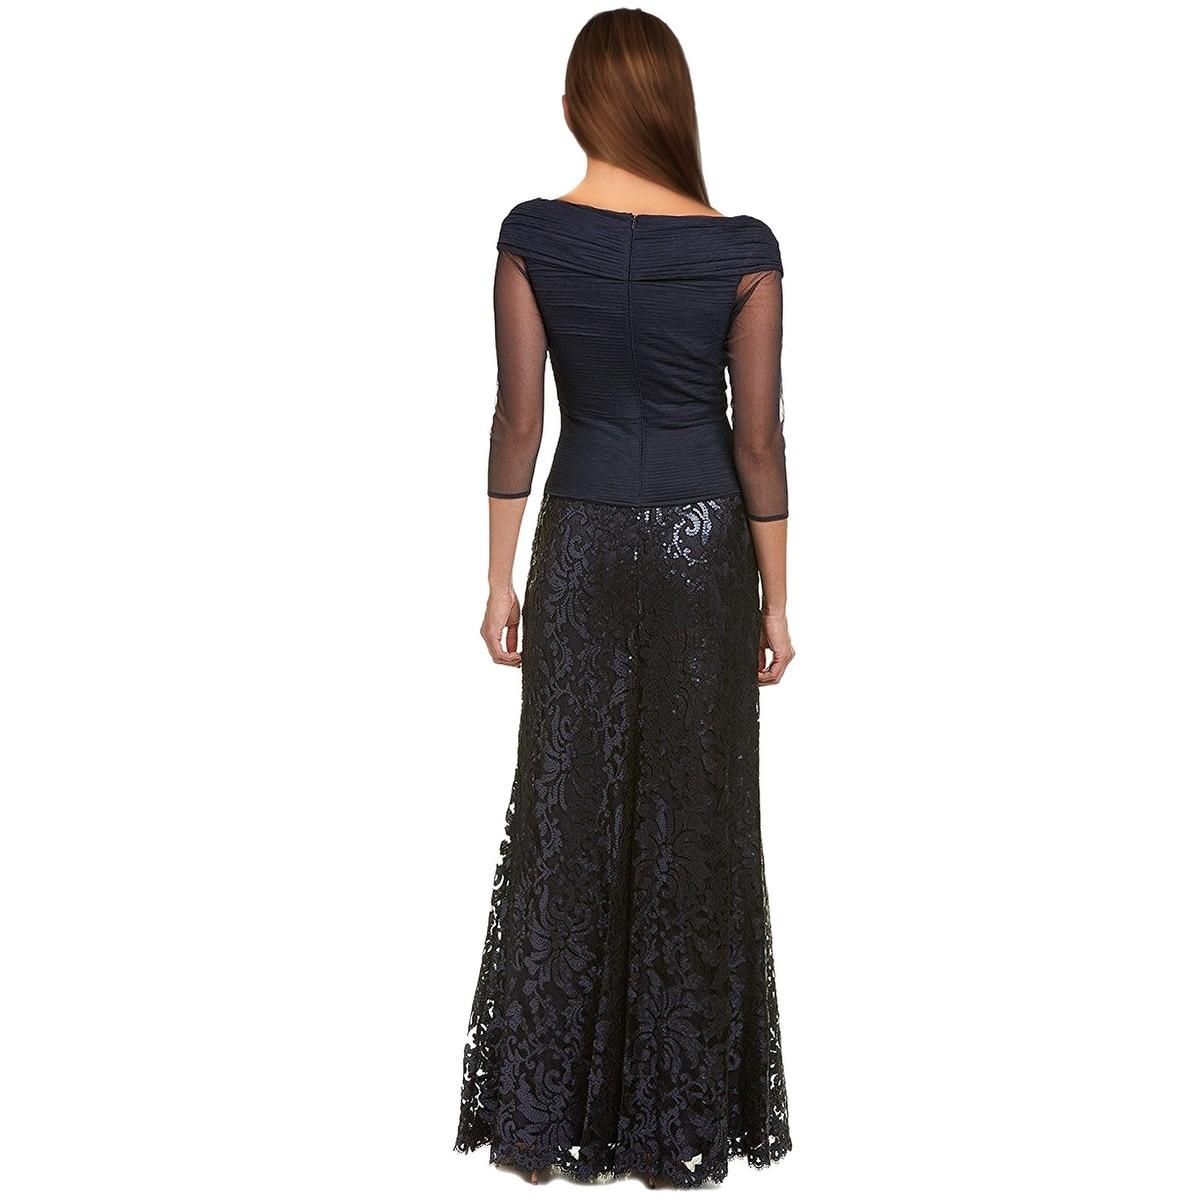 Shop Tadashi Shoji Petite Sequined Woven 3/4 Sleeve Evening Gown ...